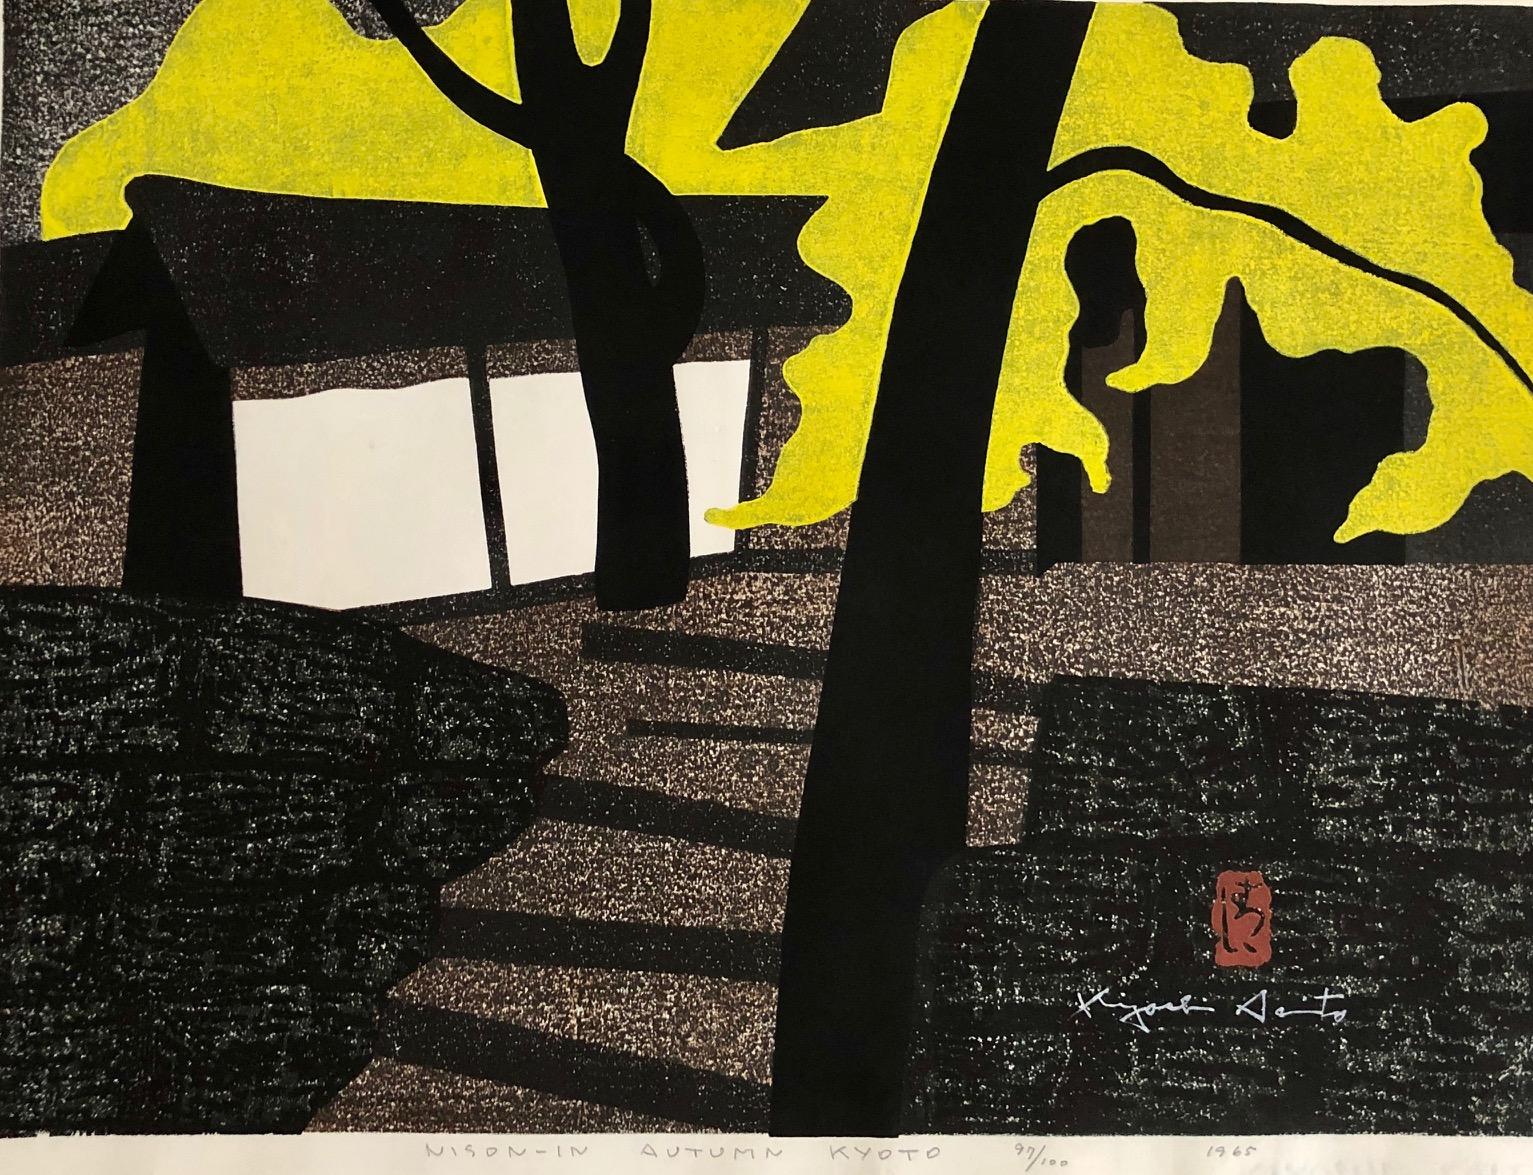 Nison-in Autumn Kyoto by  Kiyoshi Saito - Masterpiece Online